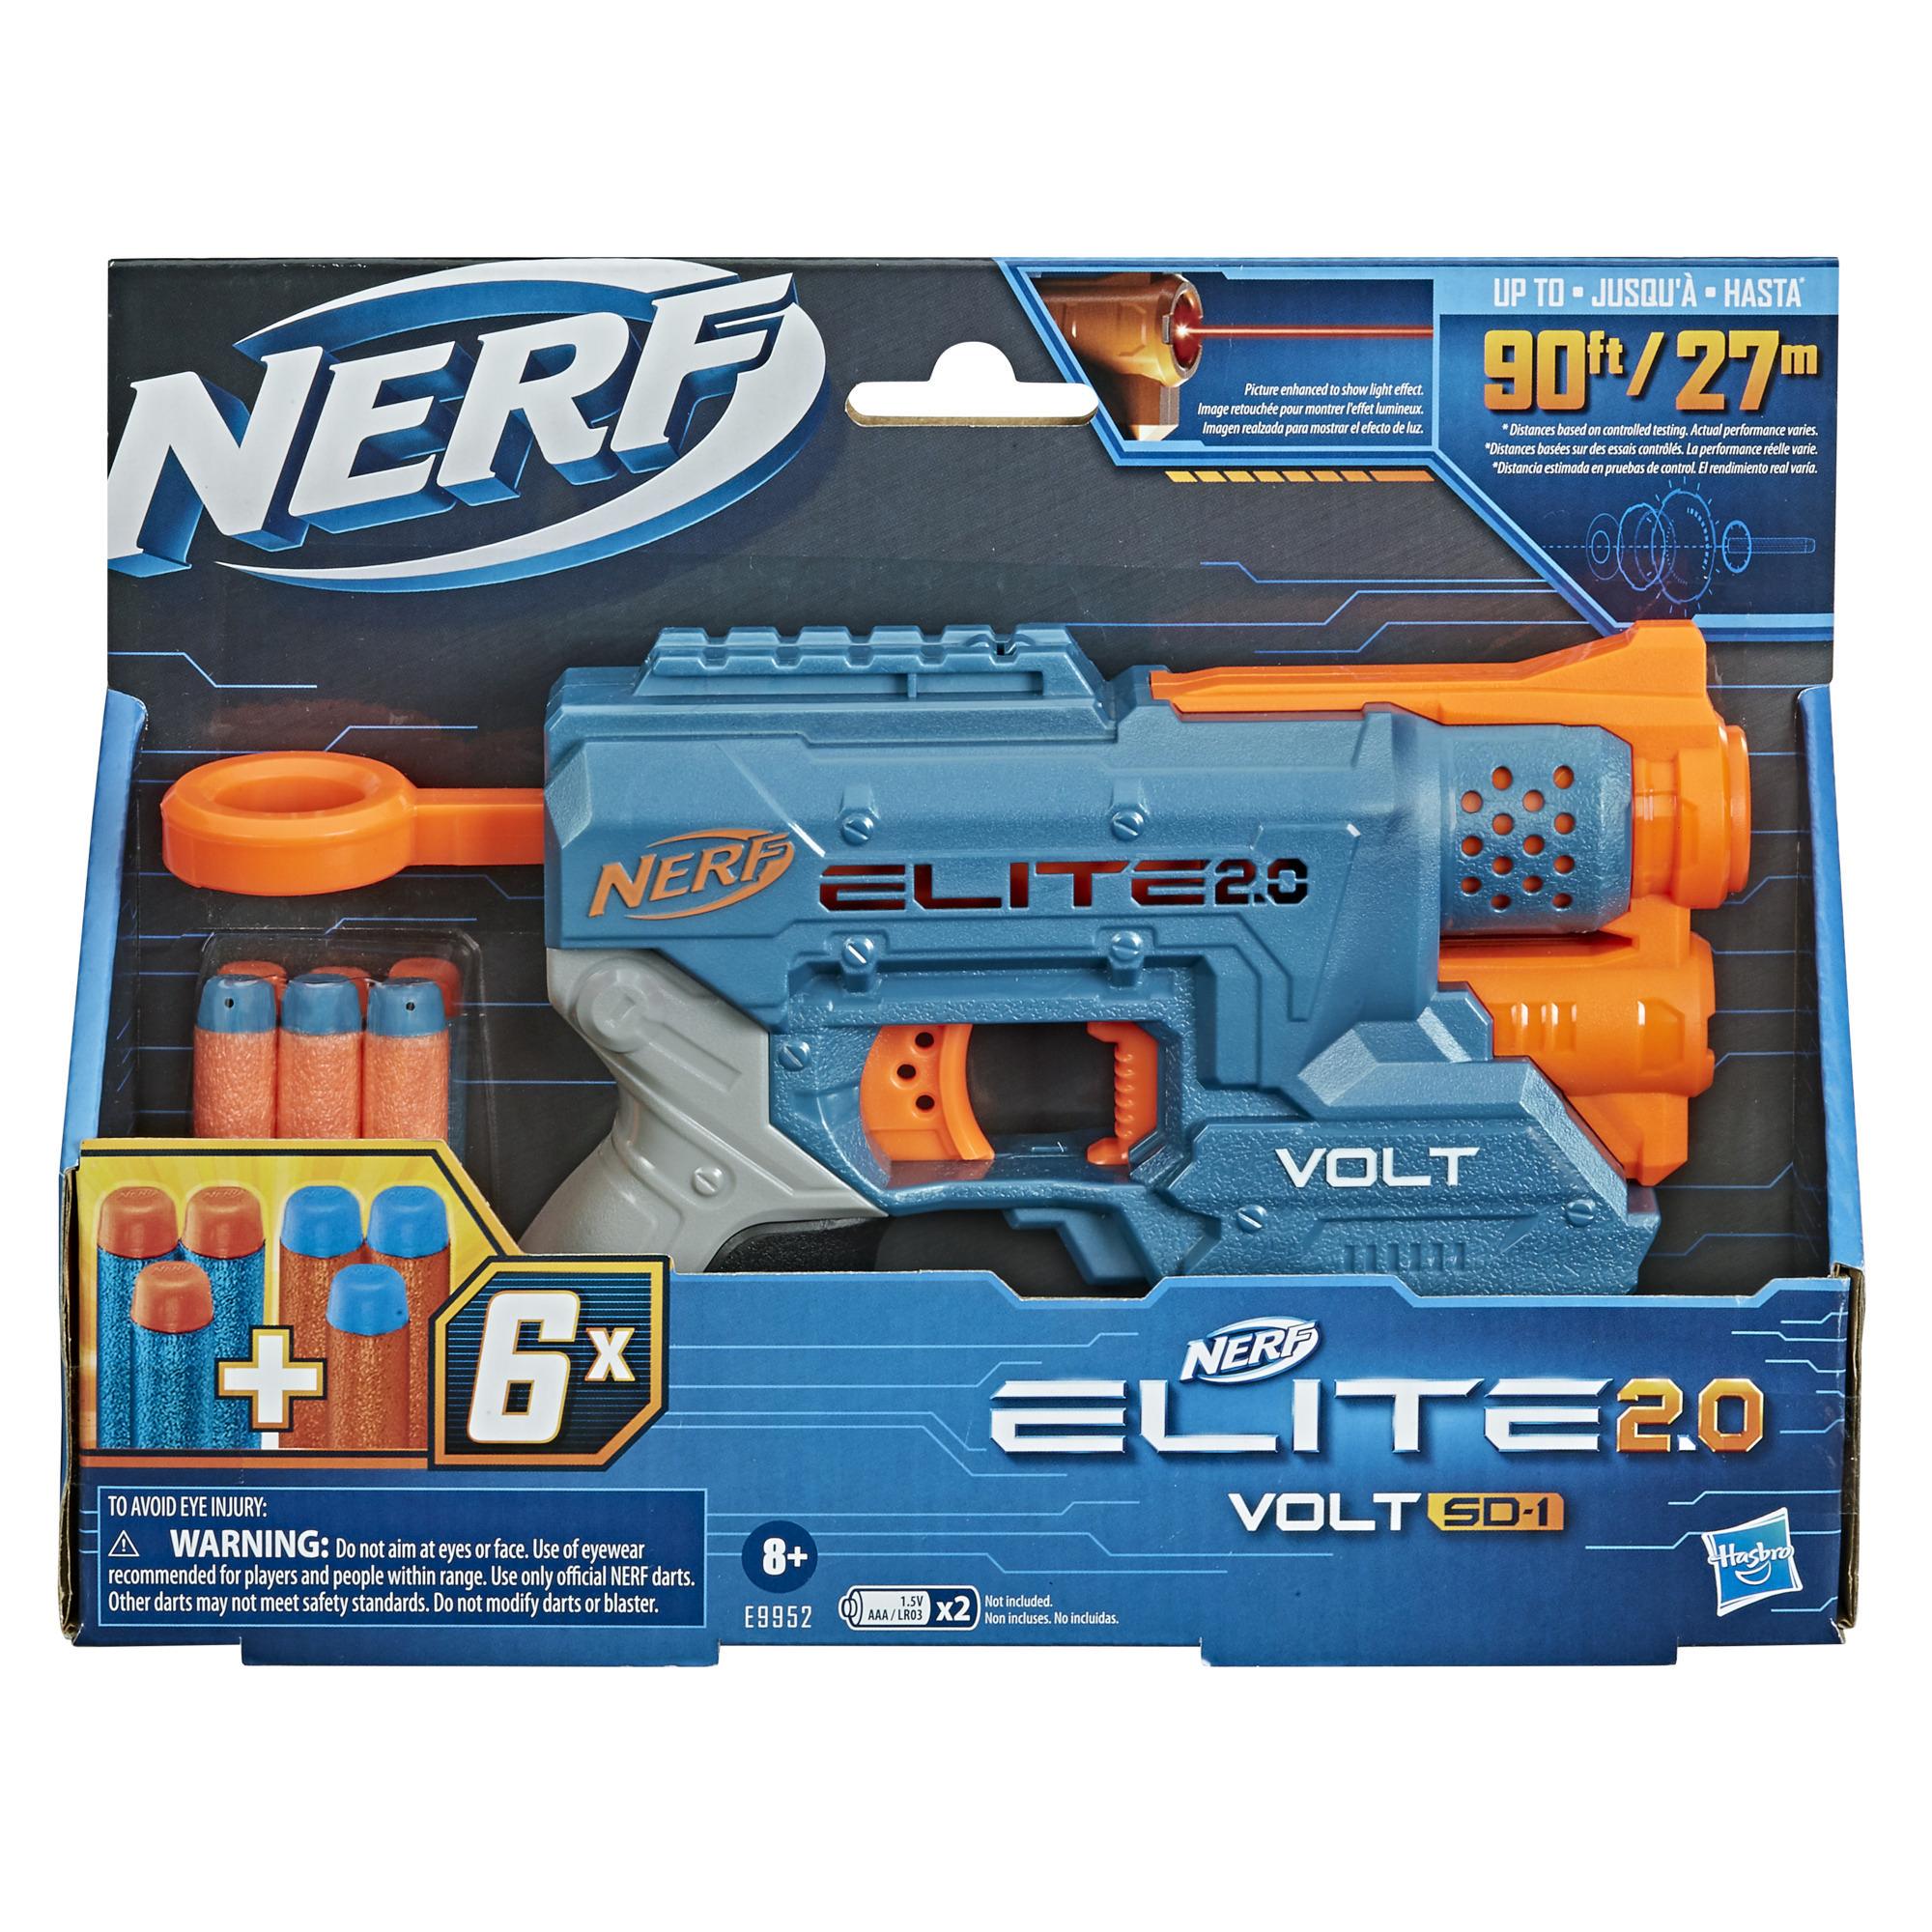 Nerf Elite 2.0 Volt SD-1 Blaster -- 6 Official Nerf Darts, Light Beam Targeting, 2-Dart Storage, 2 Tactical Rails